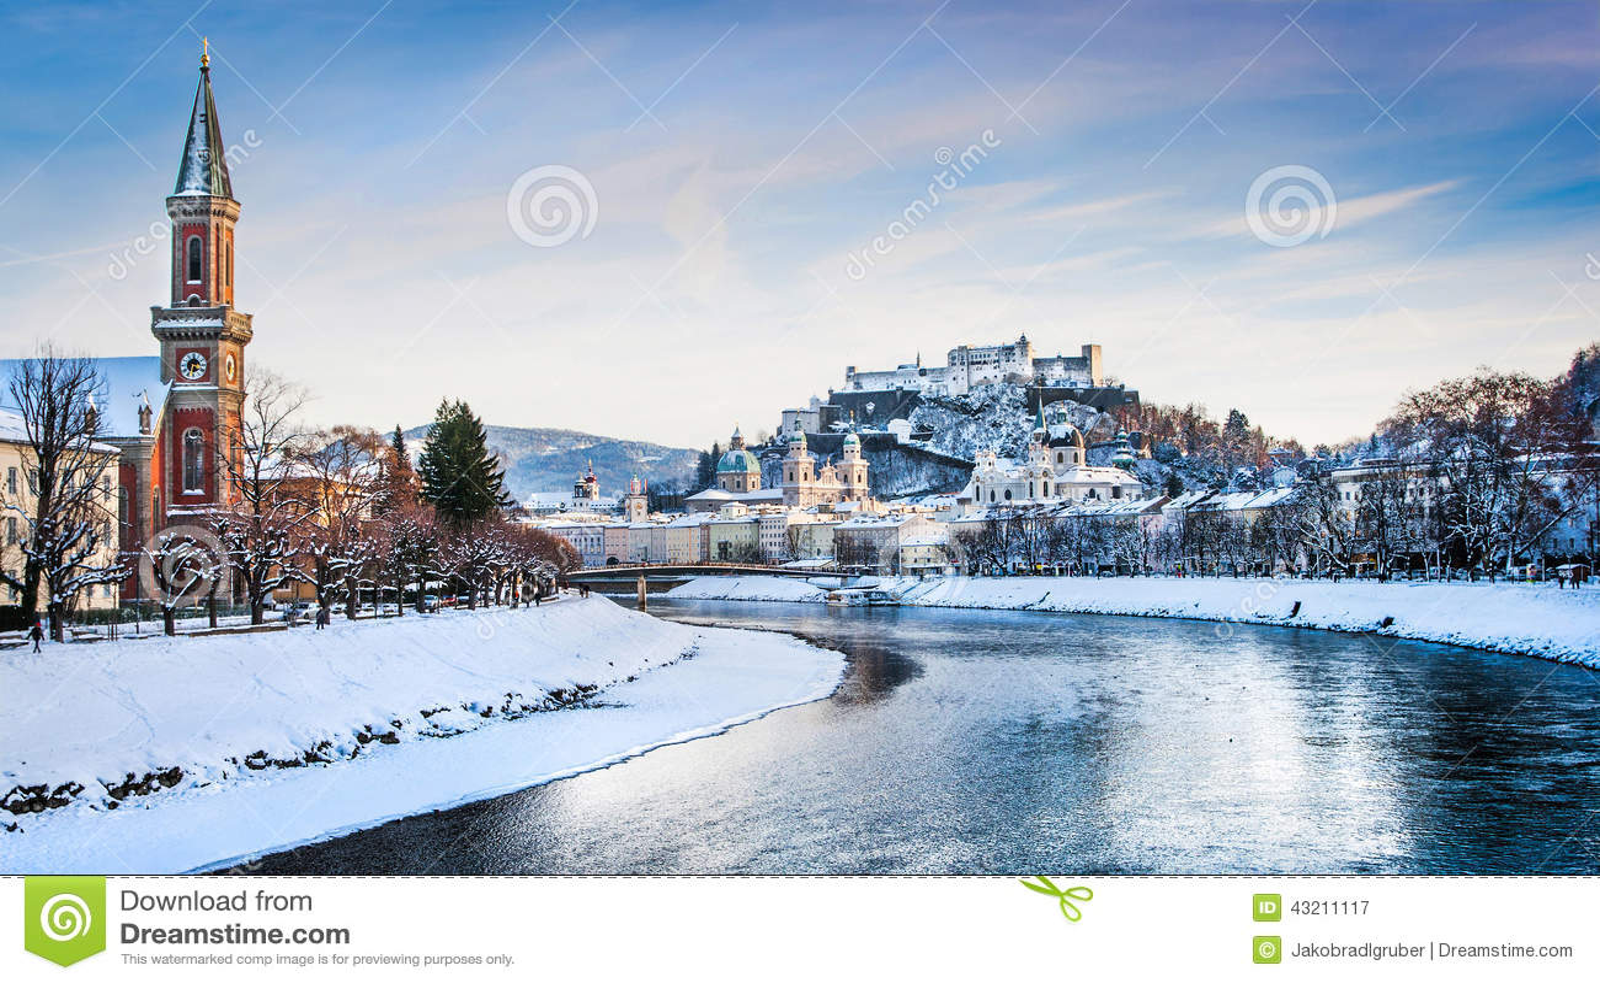 Salzburg Skyline With River Salzach In Winter Austria